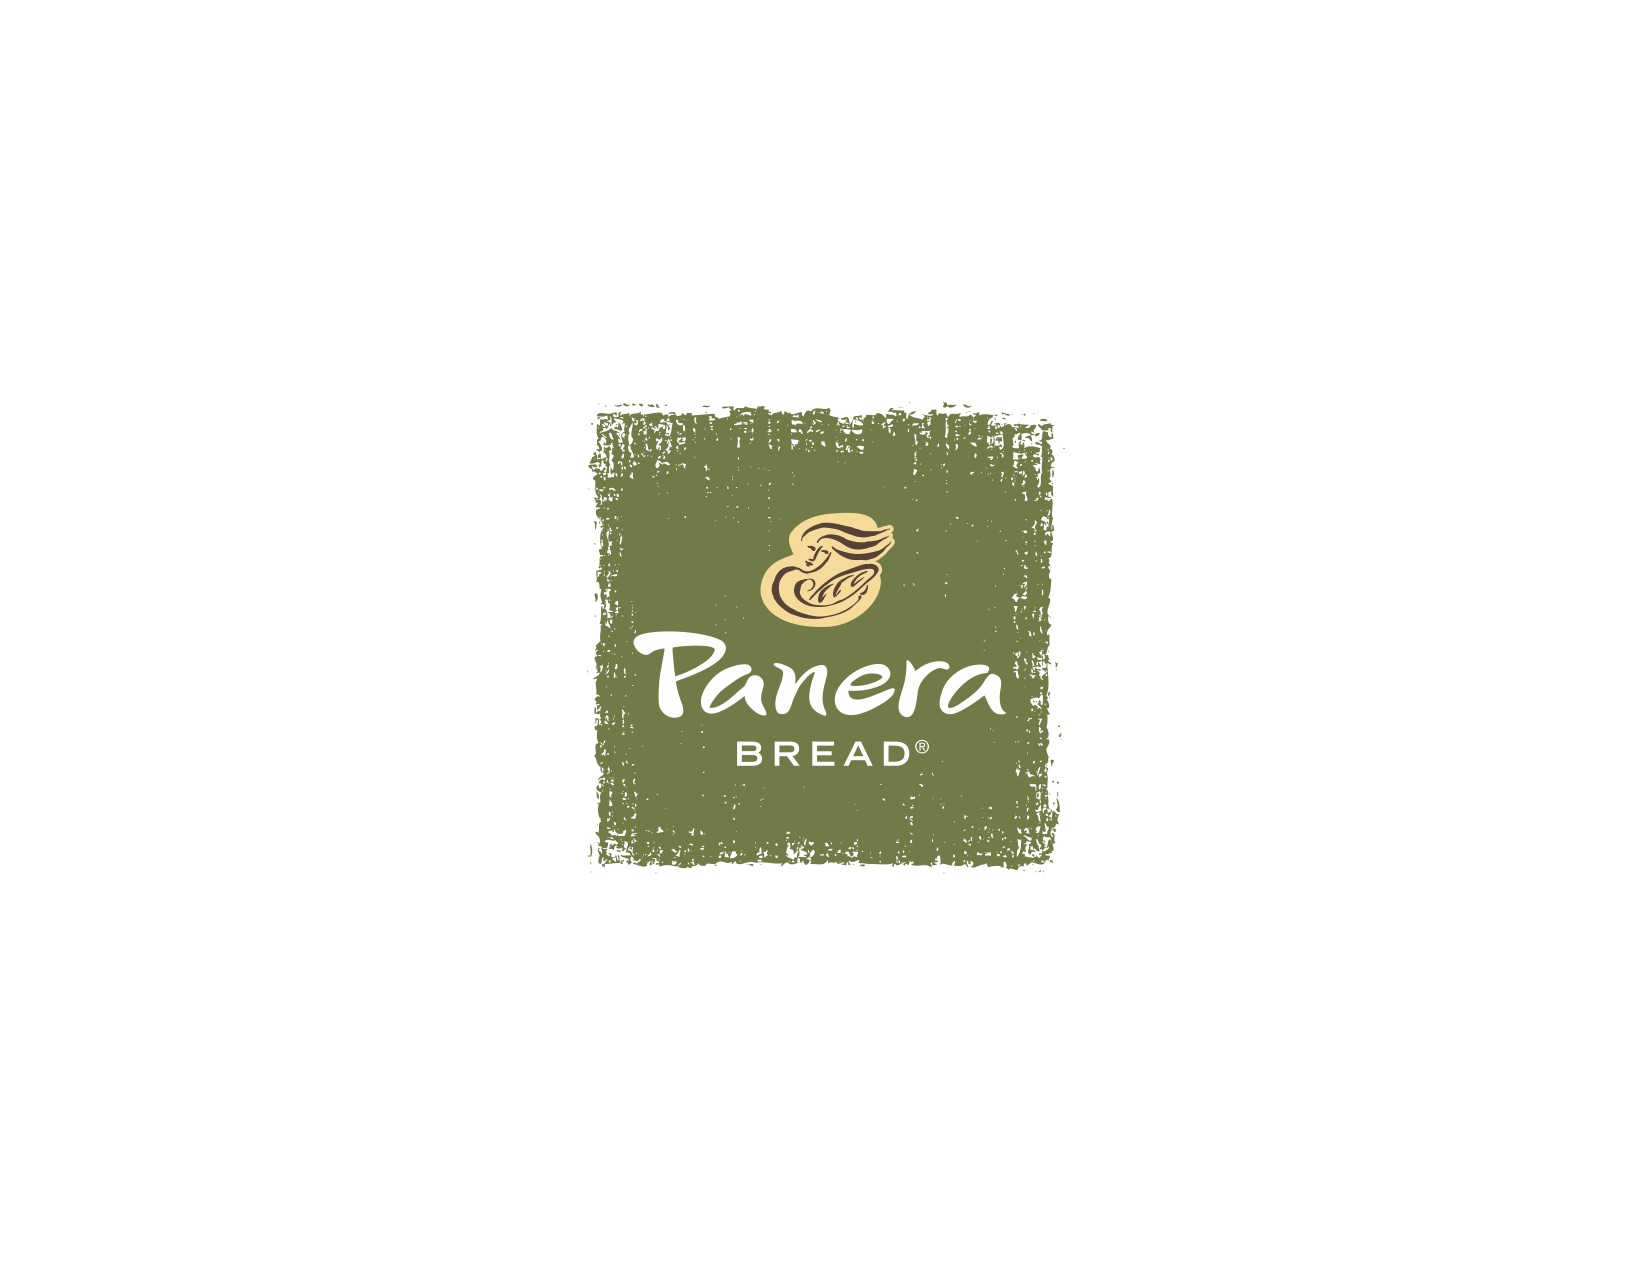 panera_bread_4c.jpg